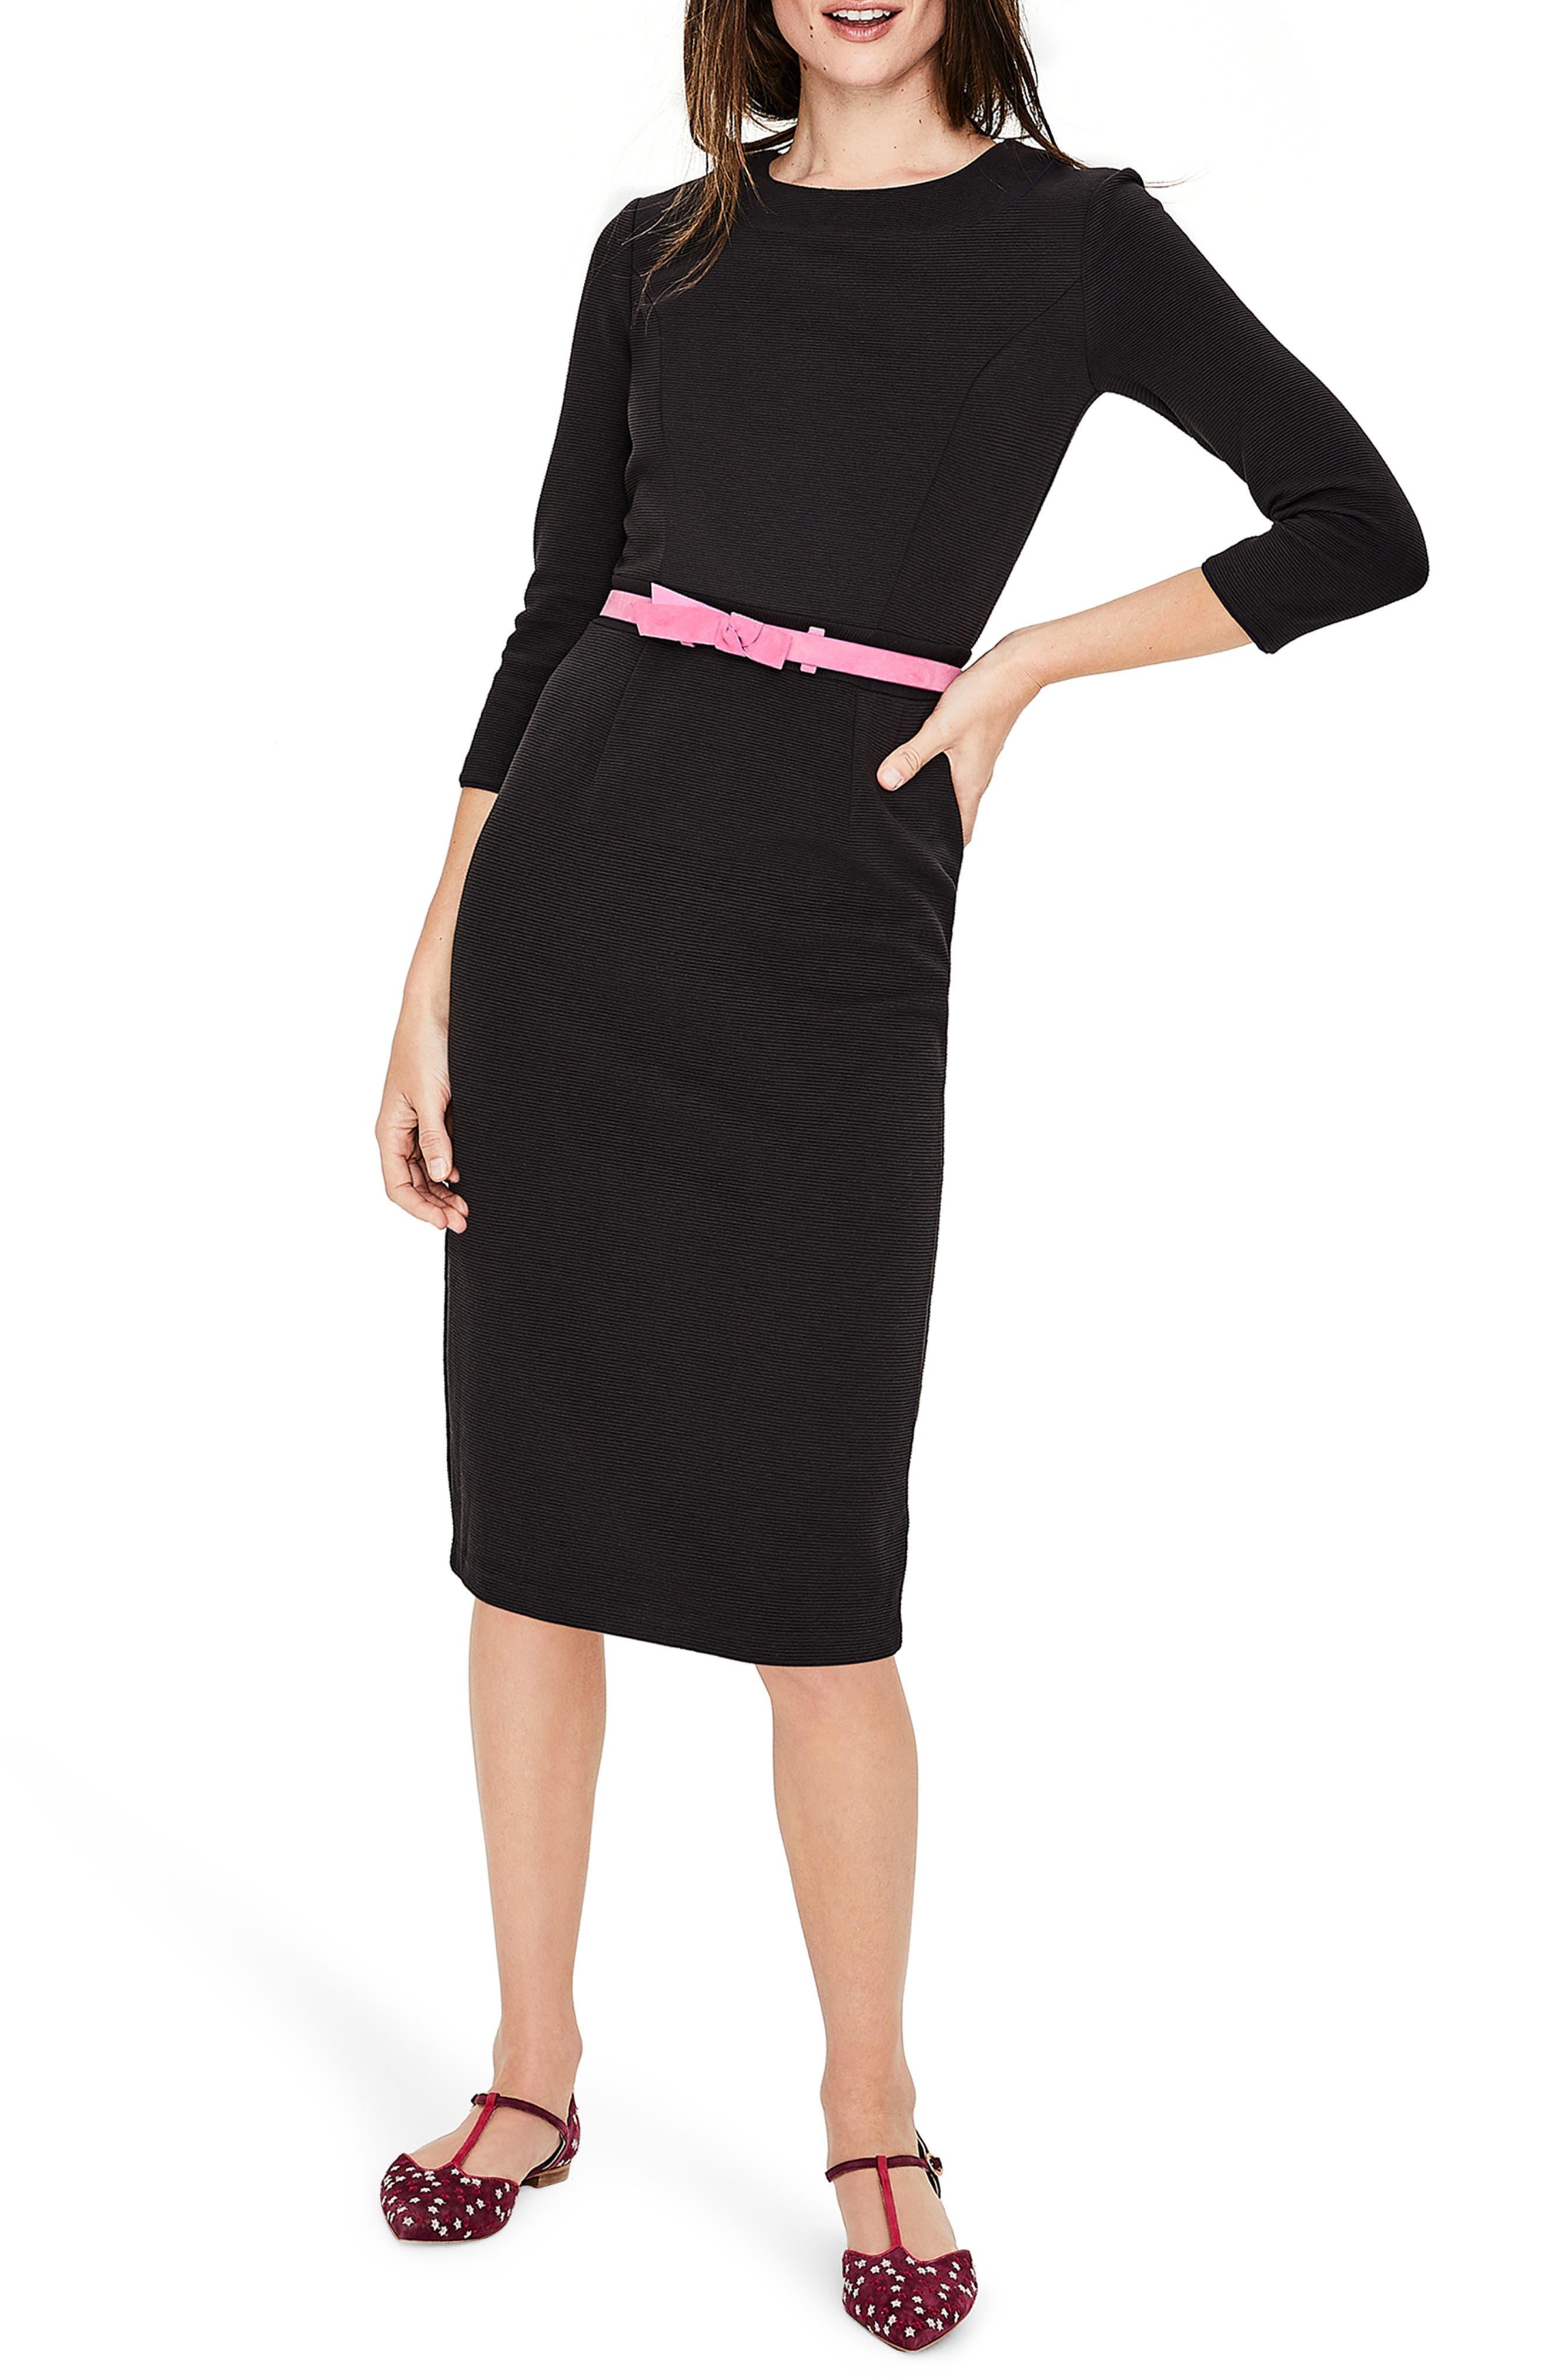 Mia Ottoman Dress,                             Main thumbnail 1, color,                             014